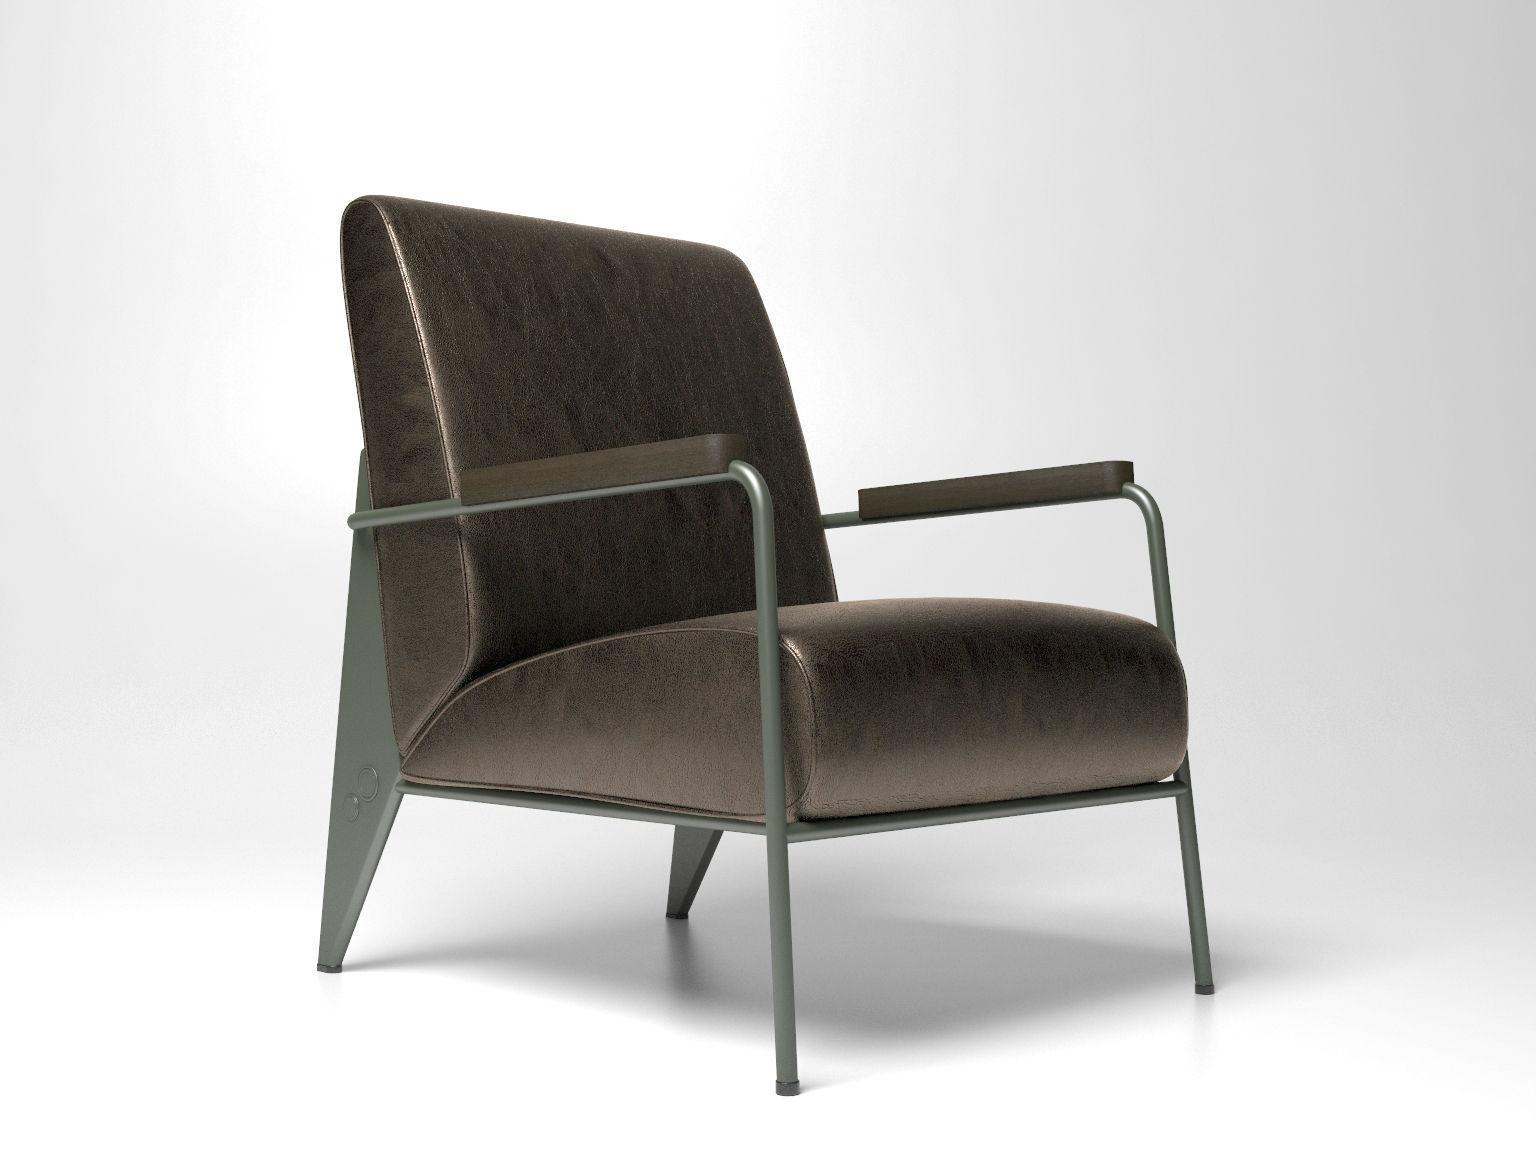 fauteuil de salon haut 3d model obj max 9fd6faaf 277d 42c4 ad28 f34eebd78844 39 Nouveau Model De Fauteuil De Salon Zzt4